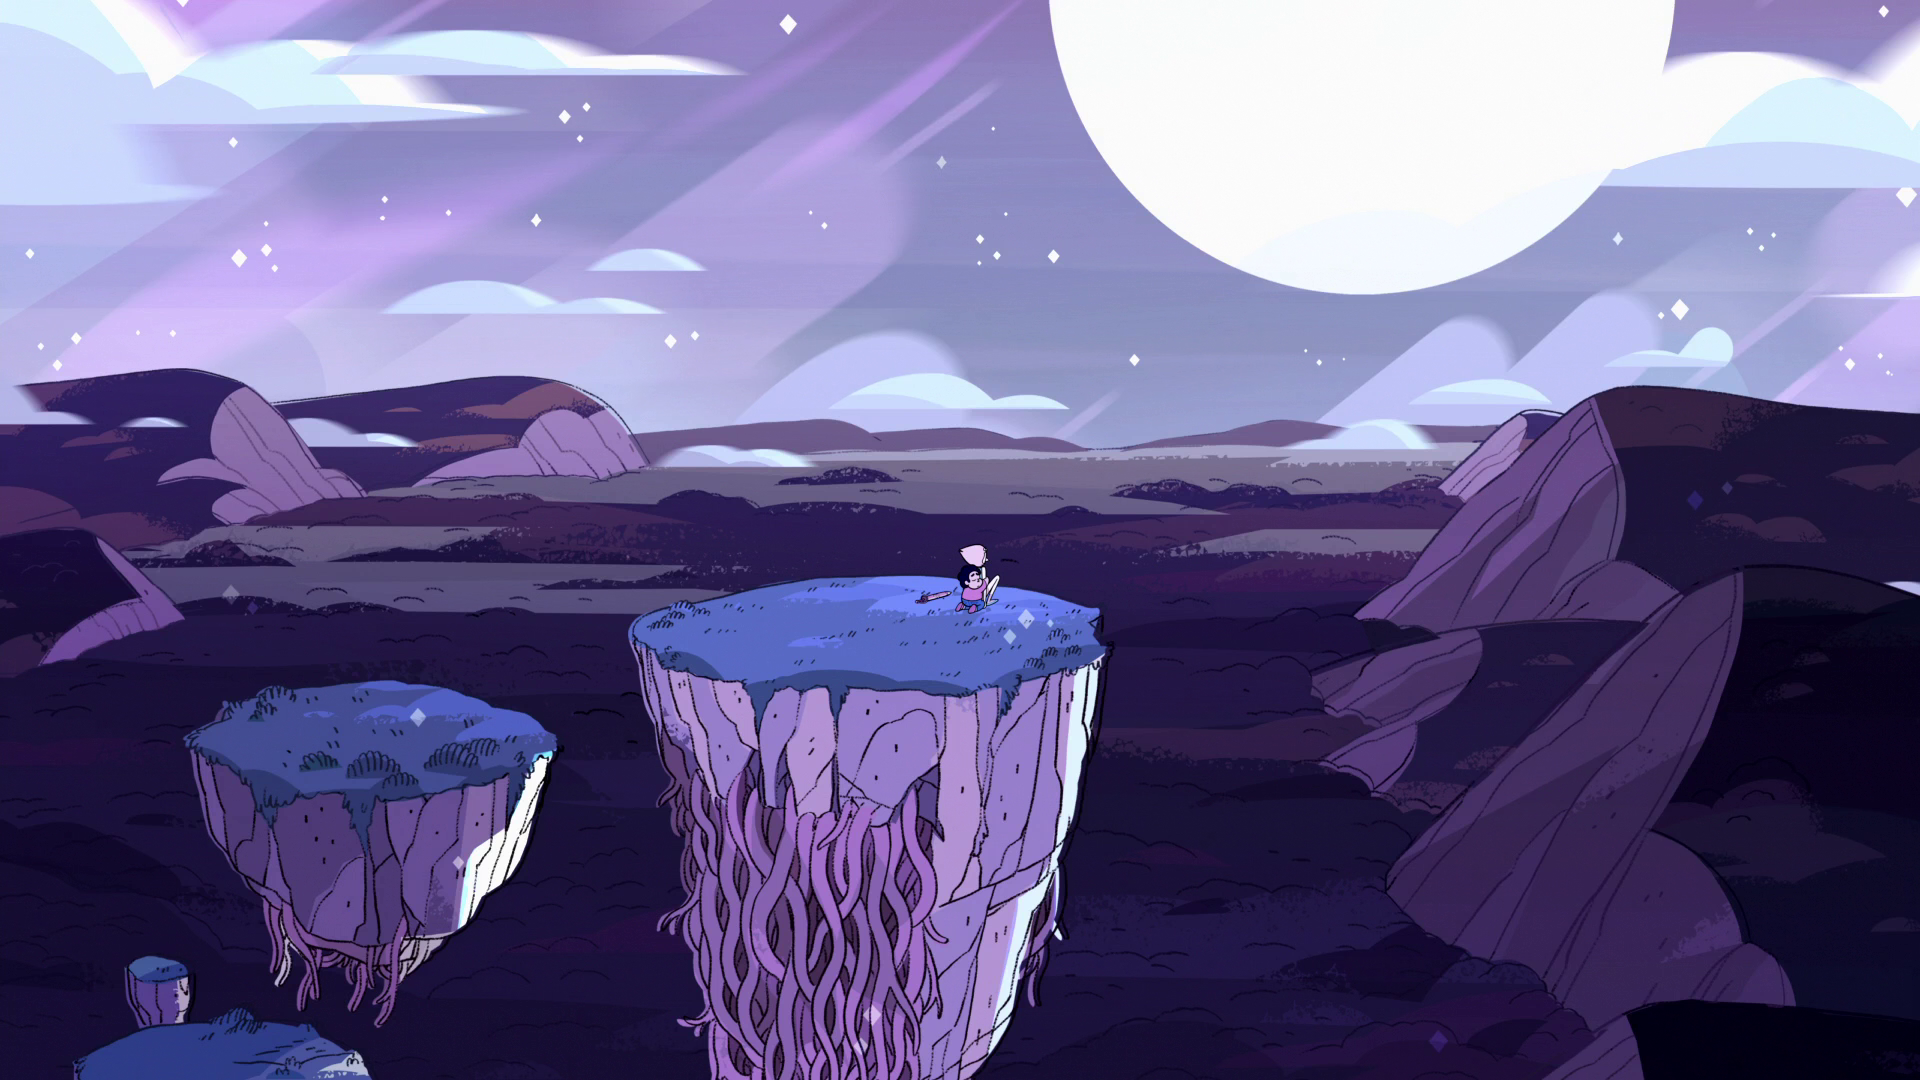 pearl steven universe wallpaper - photo #29